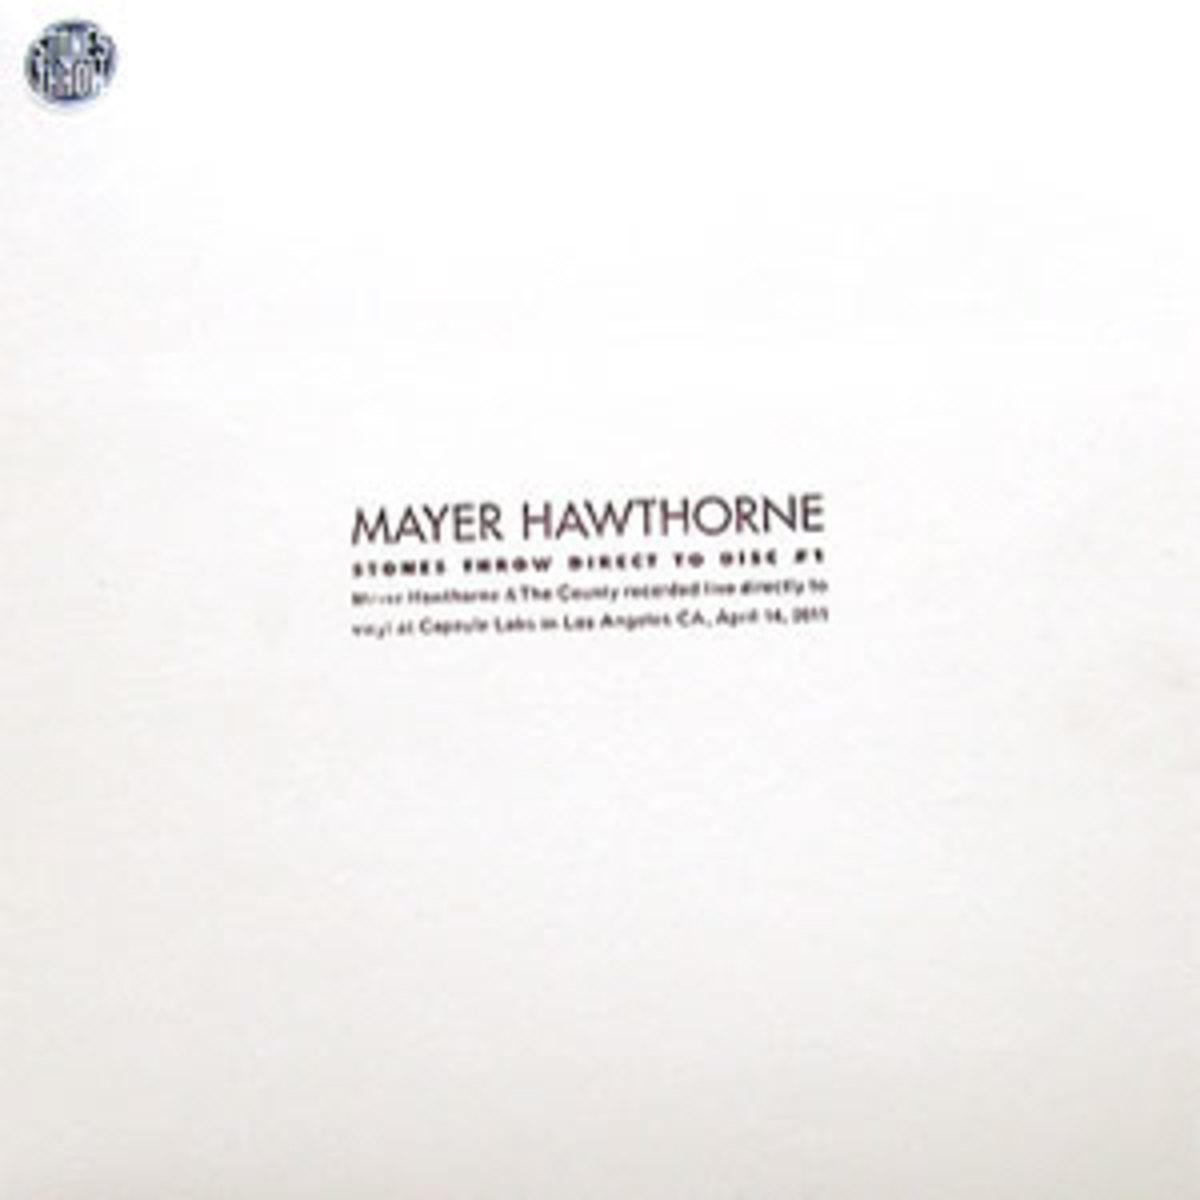 mayer.hawthorne.live